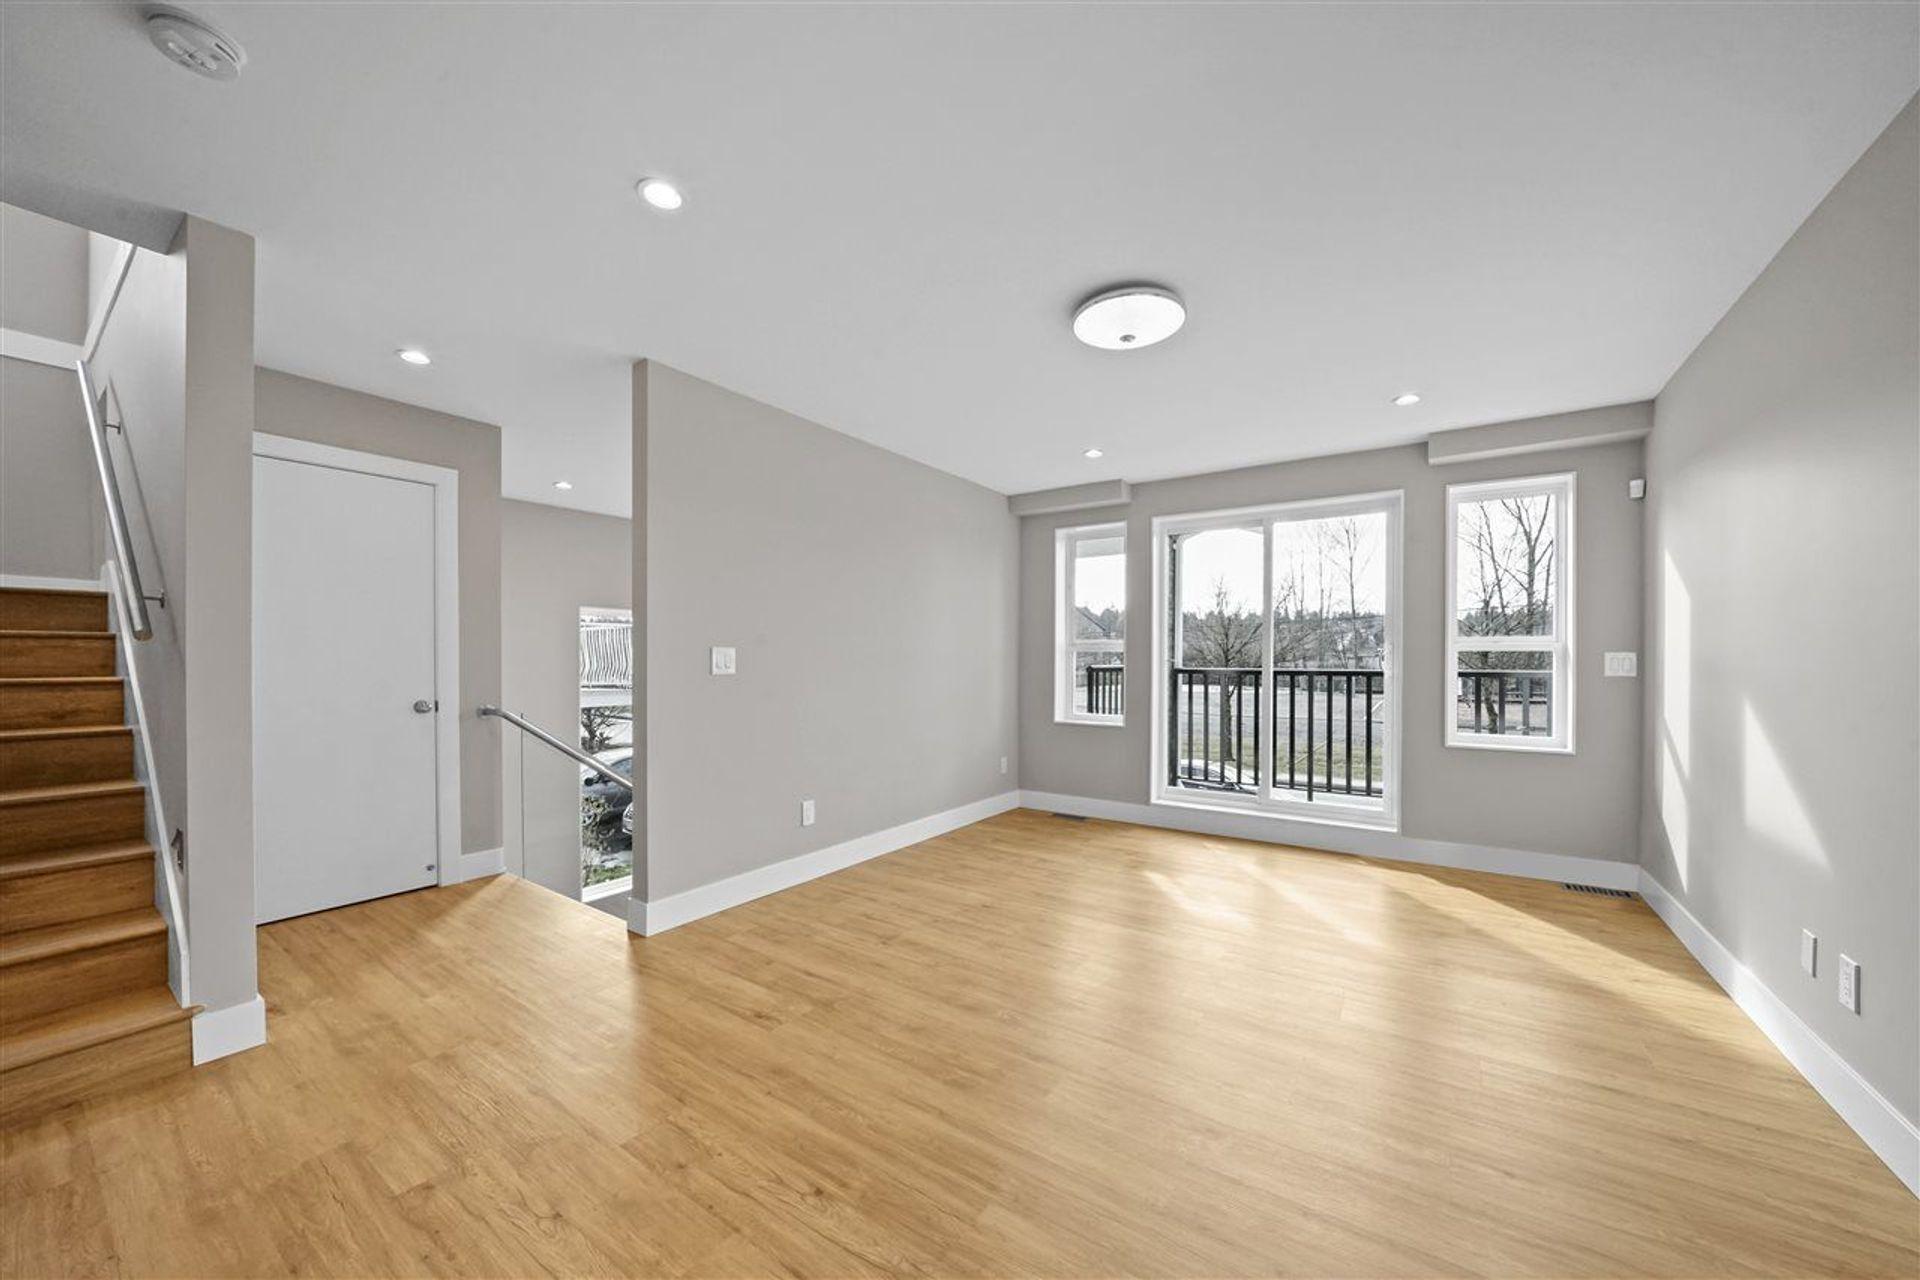 12857-115a-avenue-bridgeview-north-surrey-04 at 12857 115a Avenue, Bridgeview, North Surrey